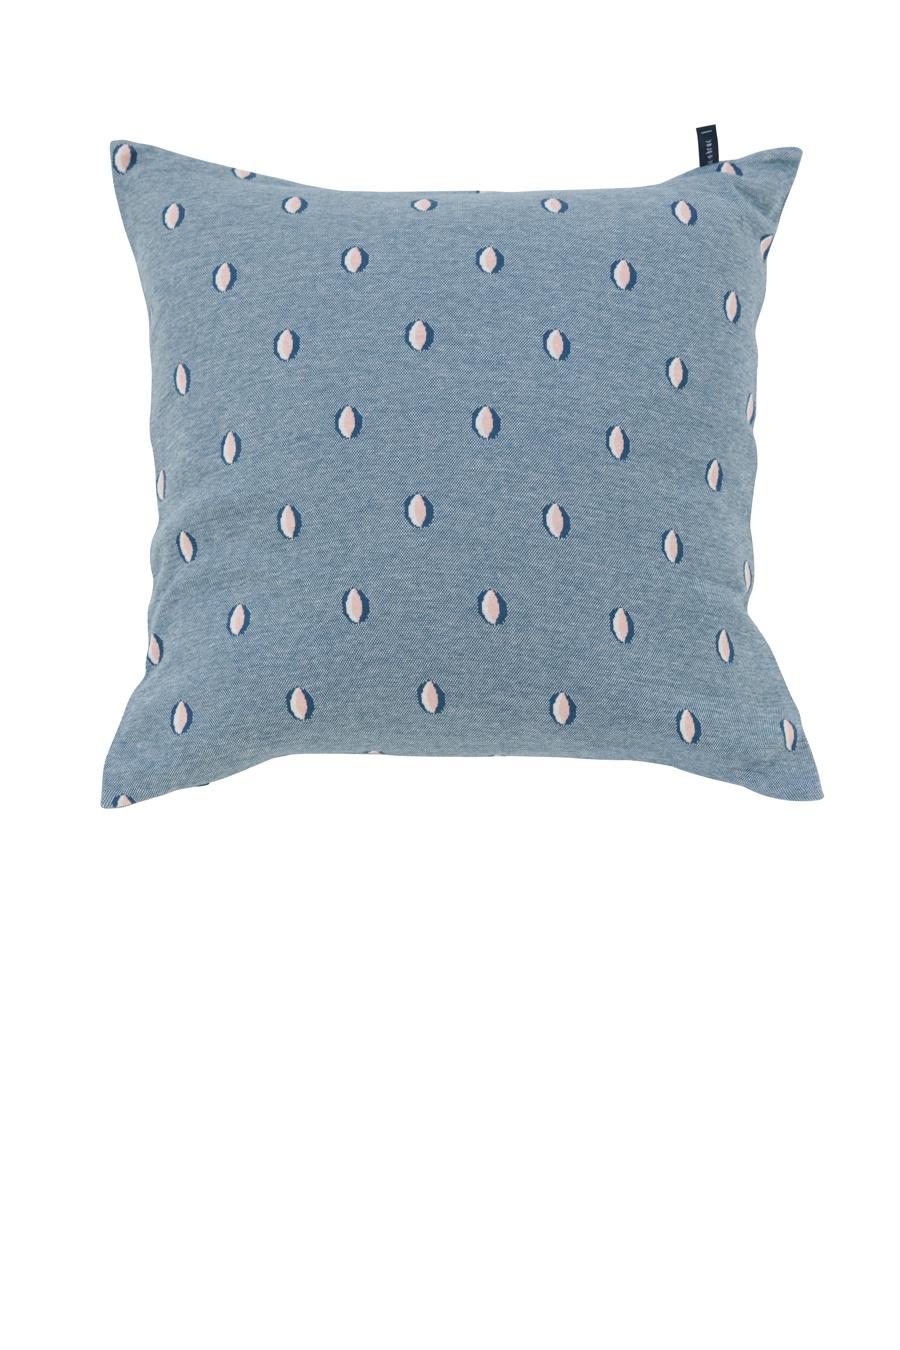 Pallone Pillow Case